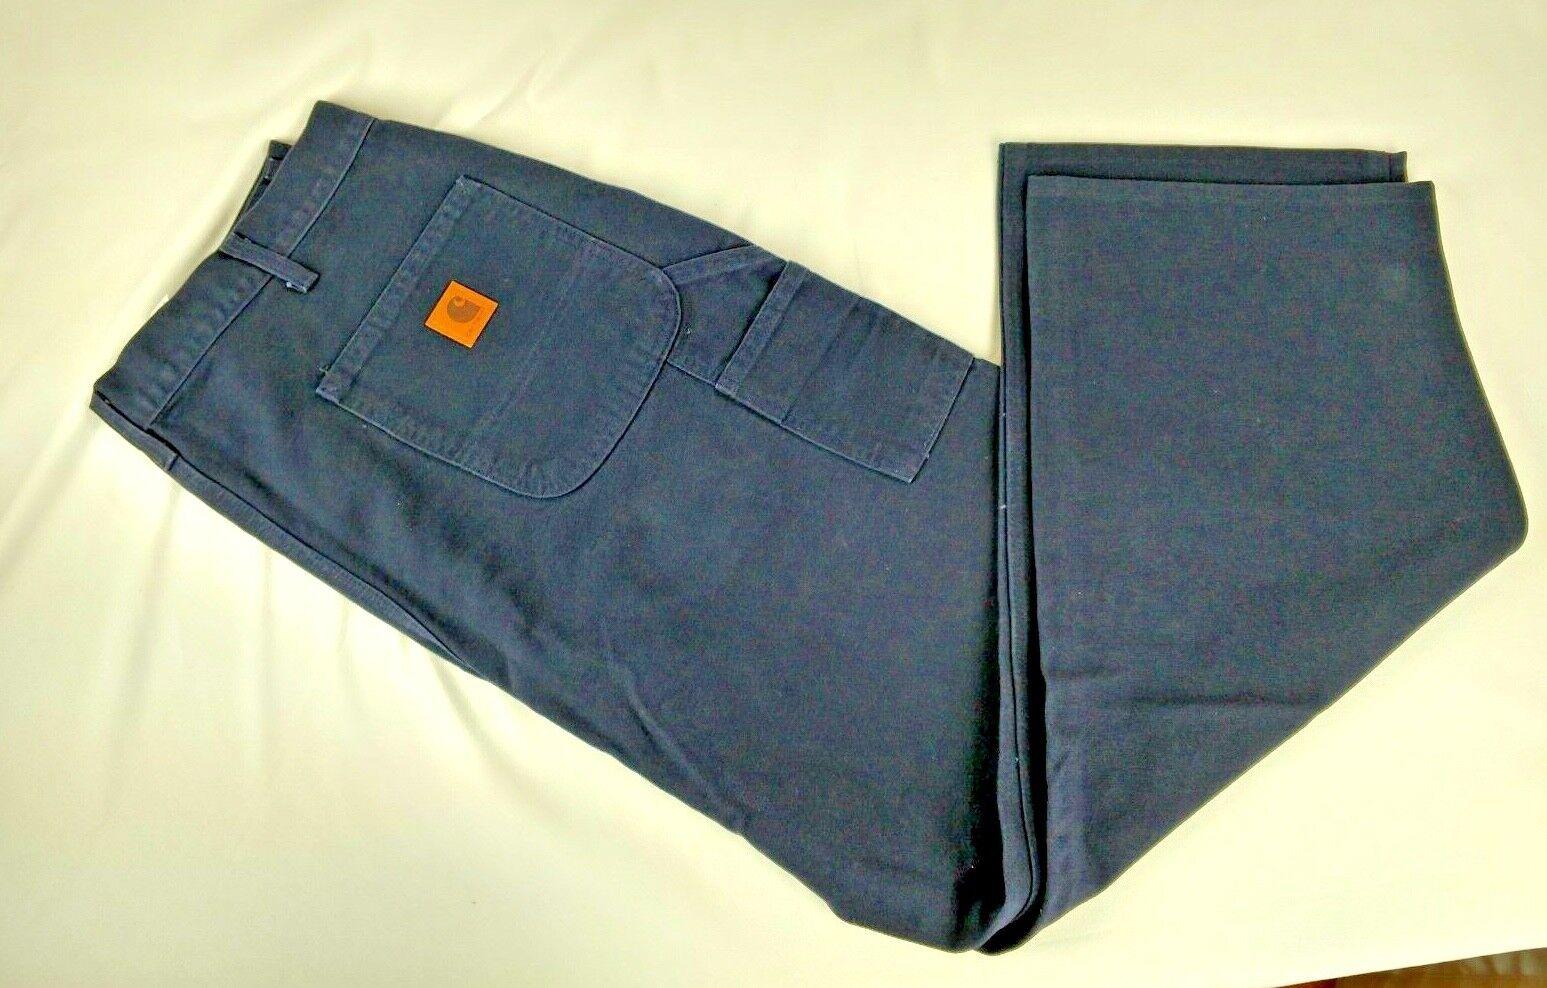 Carhartt Dungaree Original Fit Work Pants 38 32 B11 MDT Navy bluee Carpenter Jean